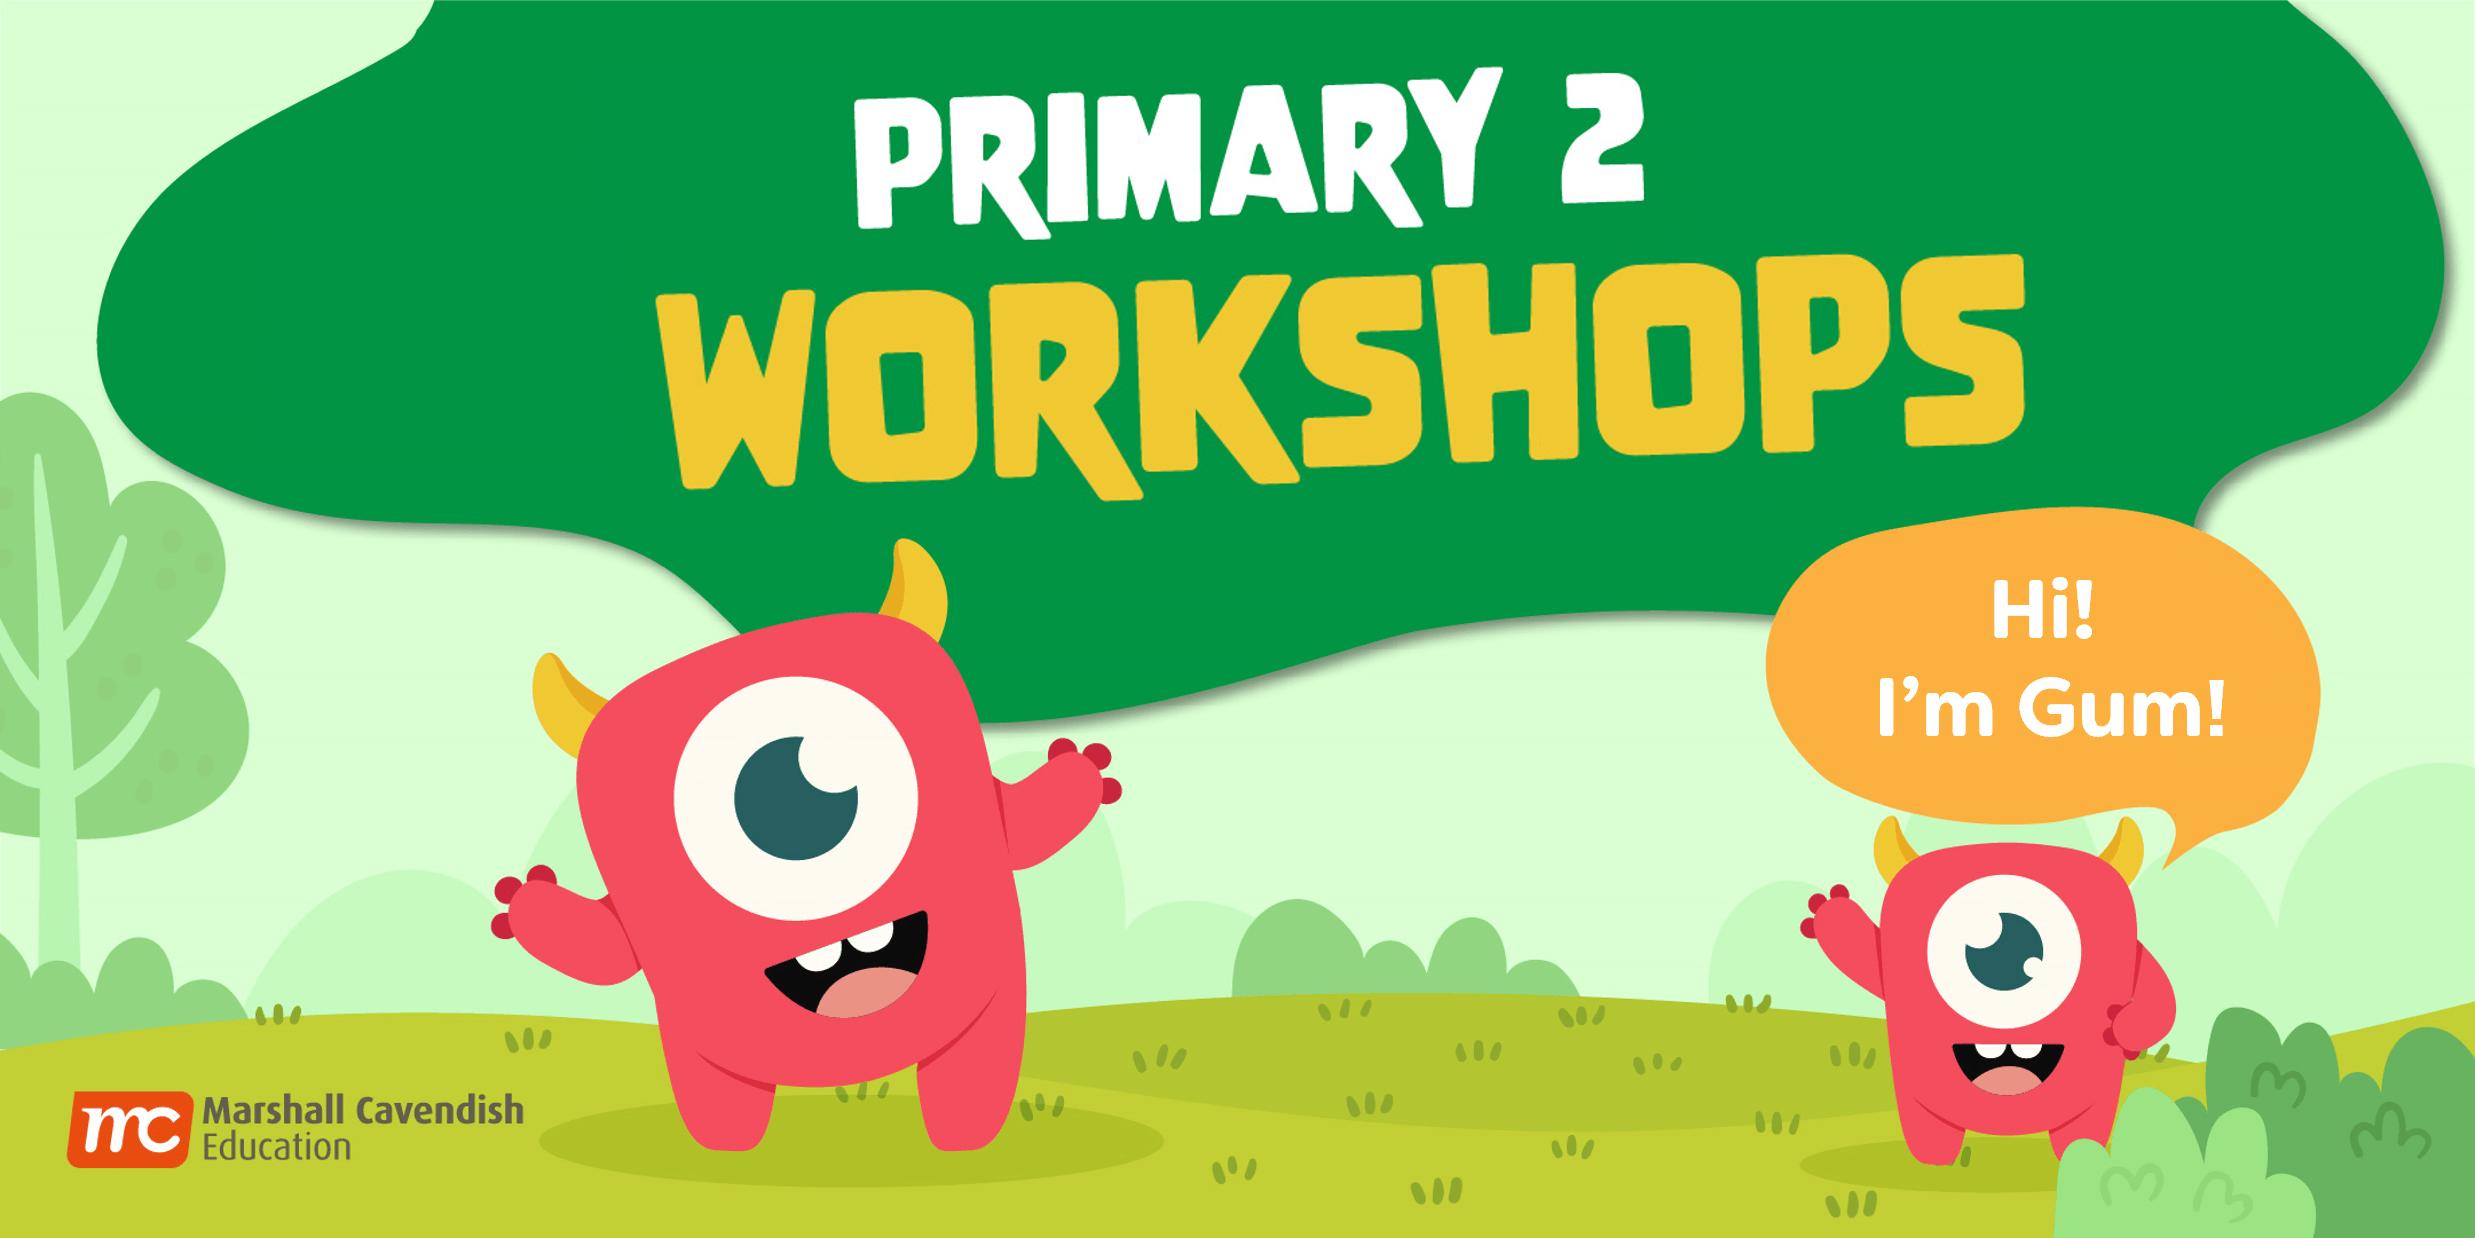 Primary 2 Workshops